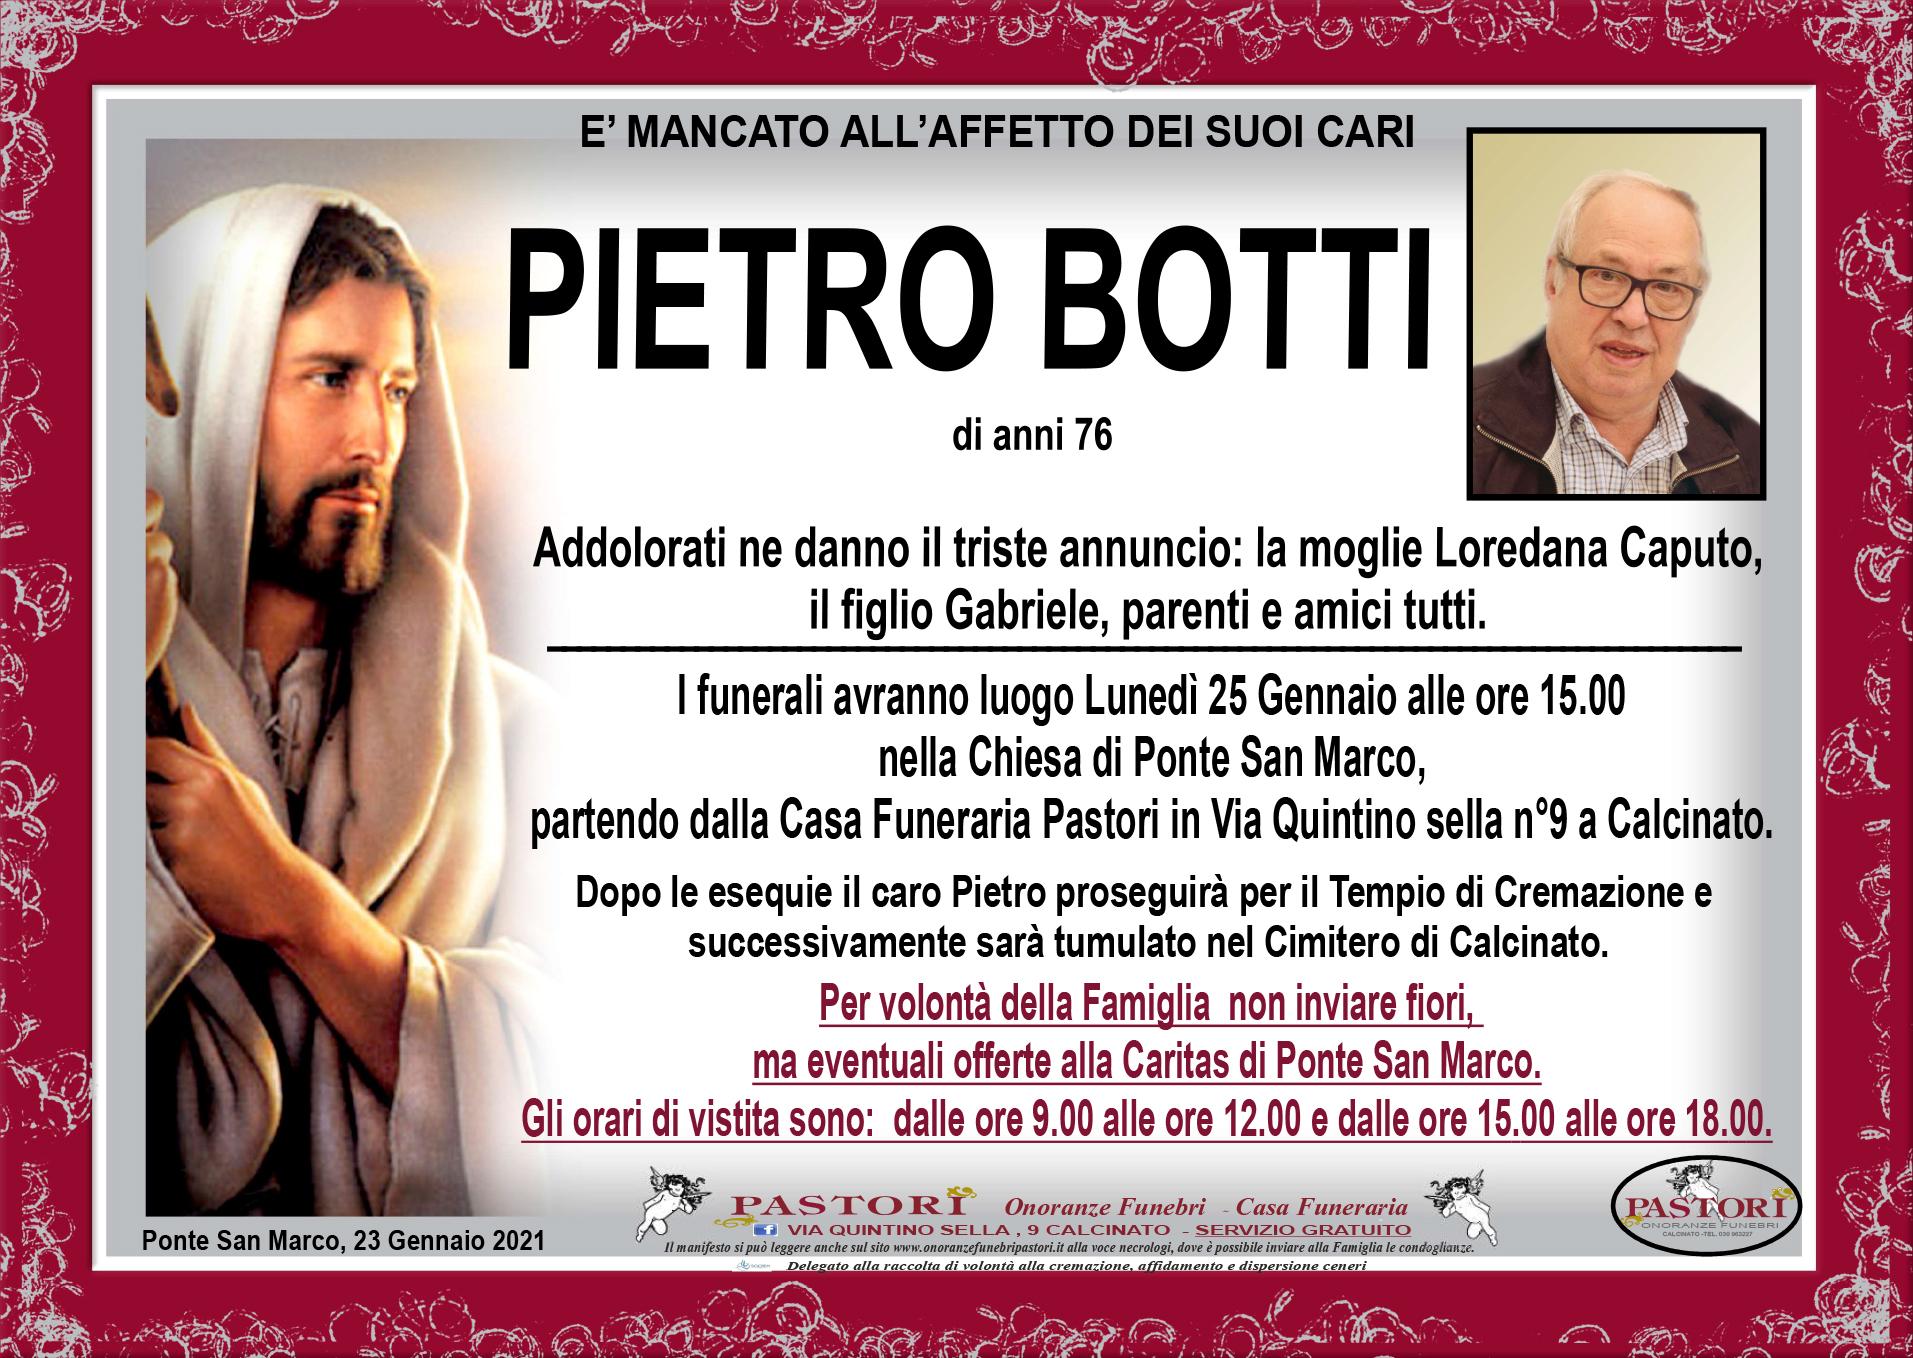 Pietro Botti